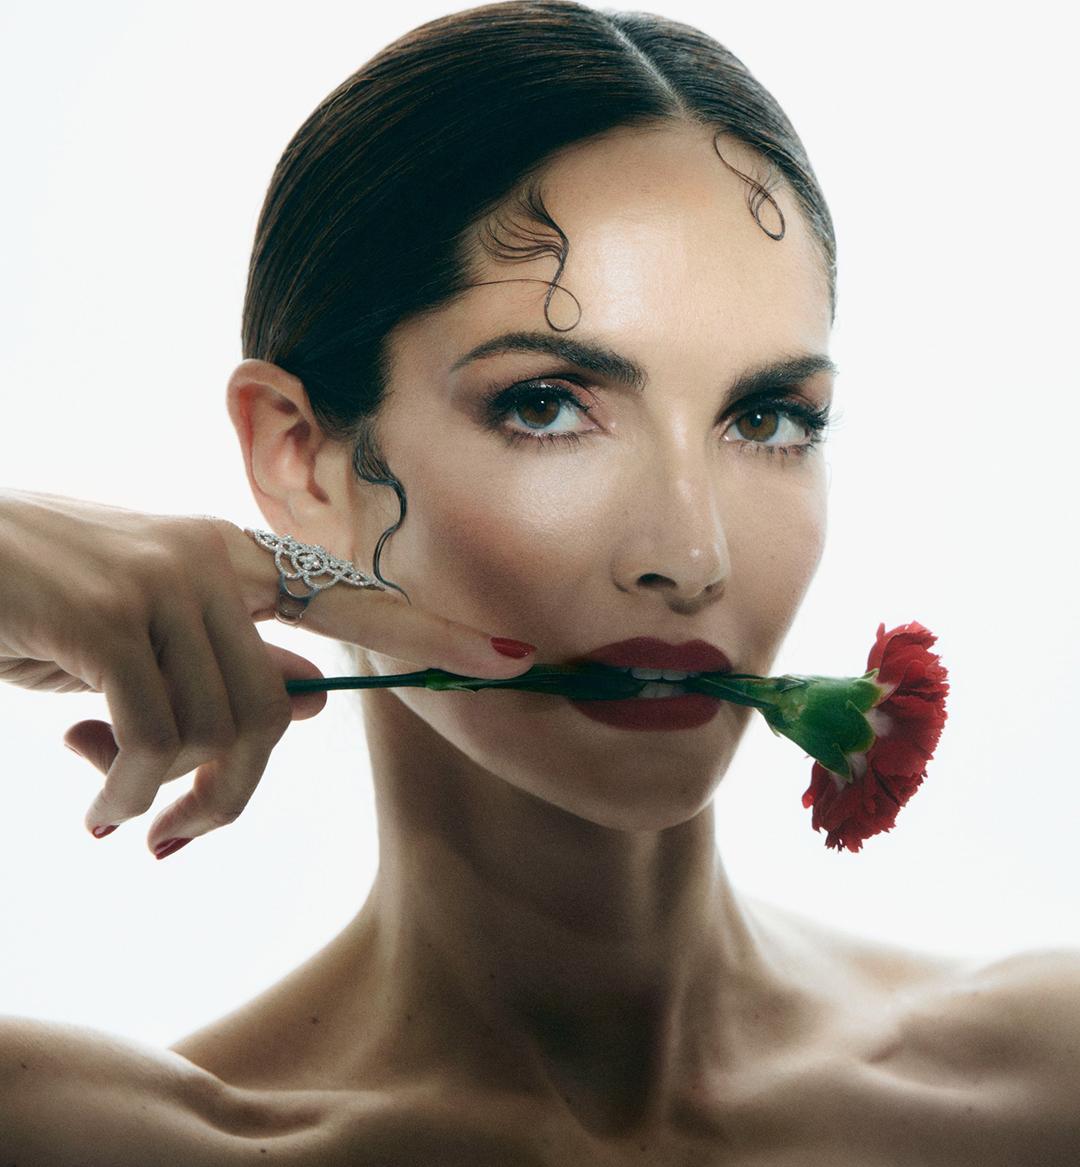 Eugenia Silva - Francesca Rinciari - Instyle - editorial - 8AM - 8 Artist Management